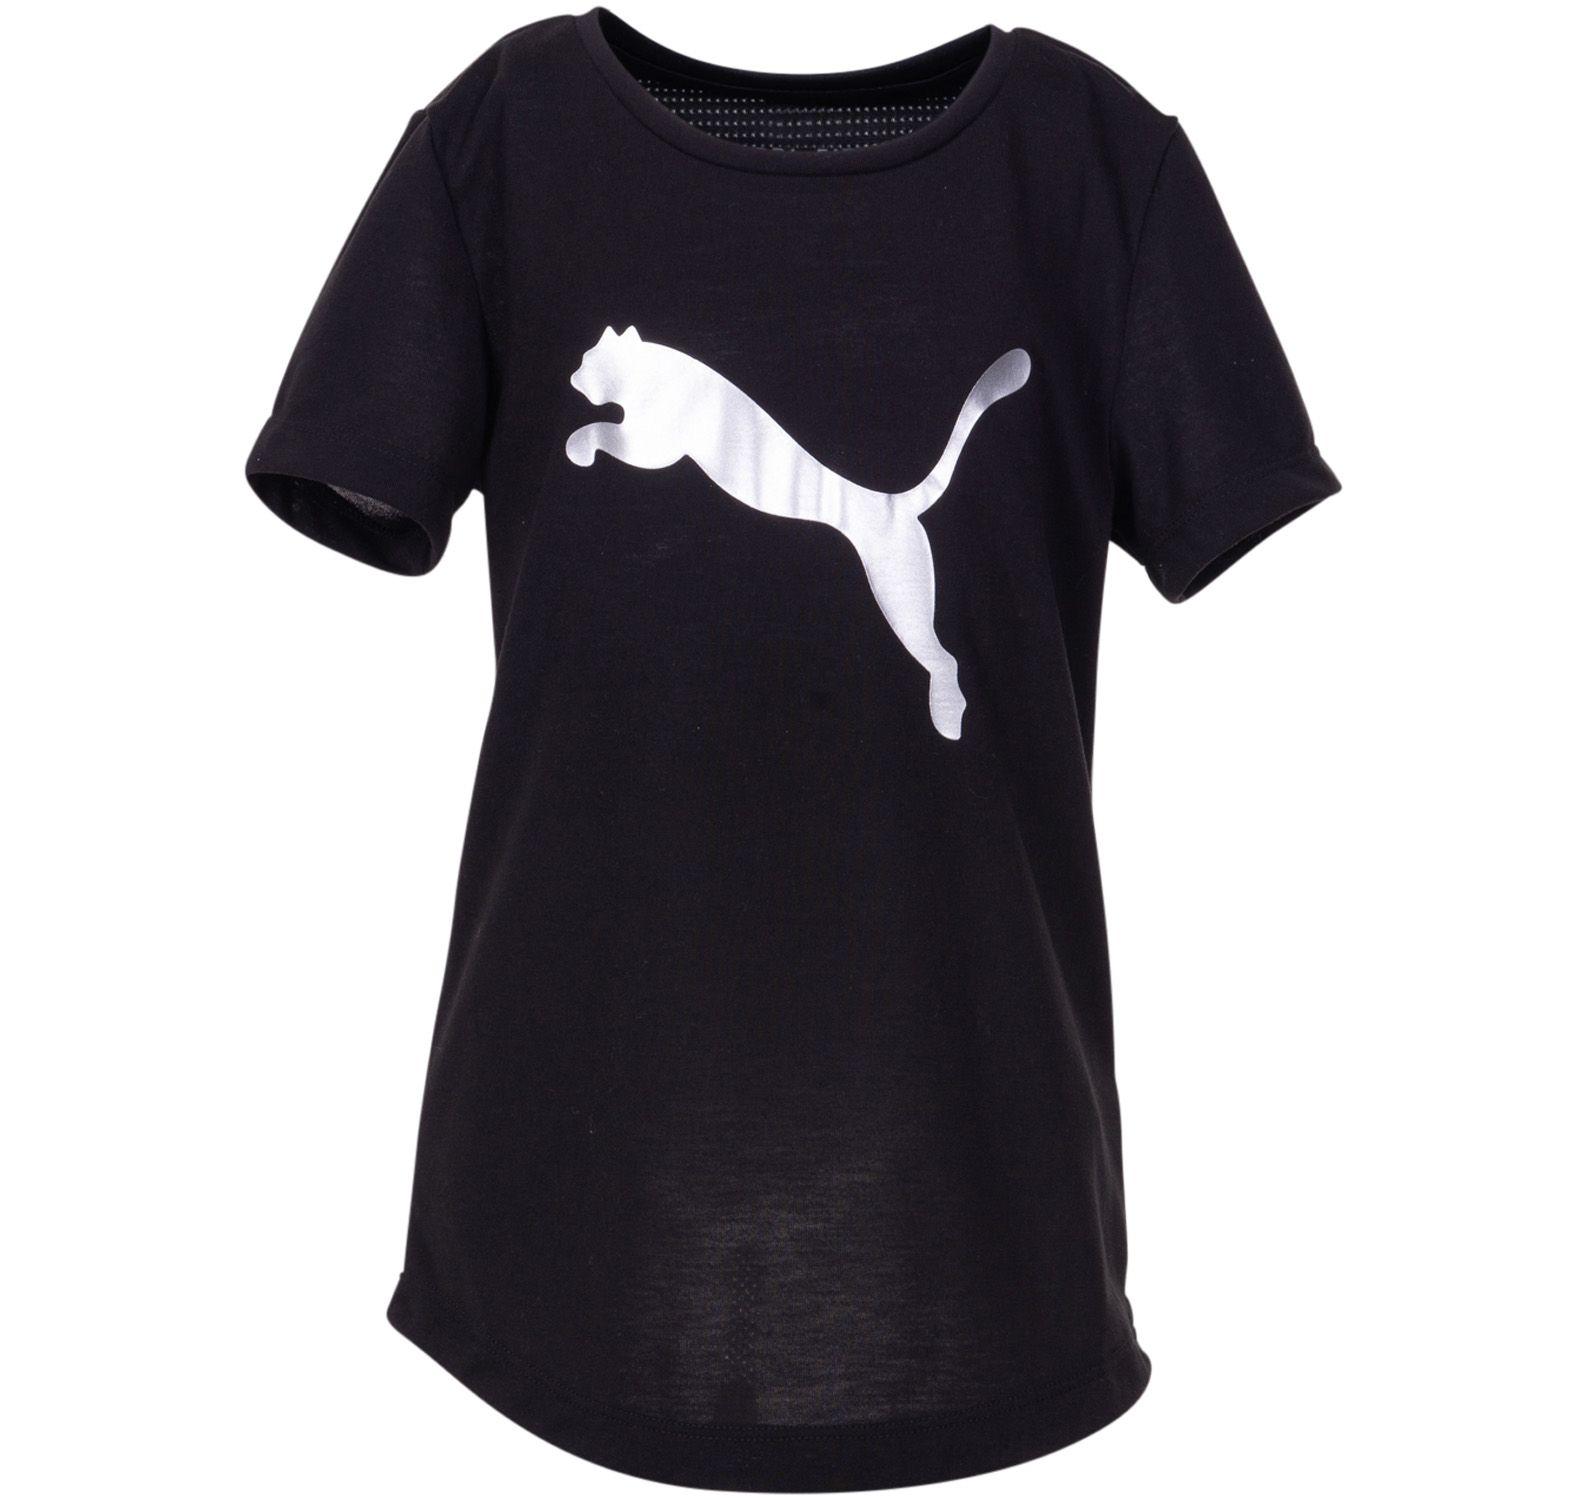 Active Sports Tee G, Puma Black-Metallic Silver, 116,  Puma